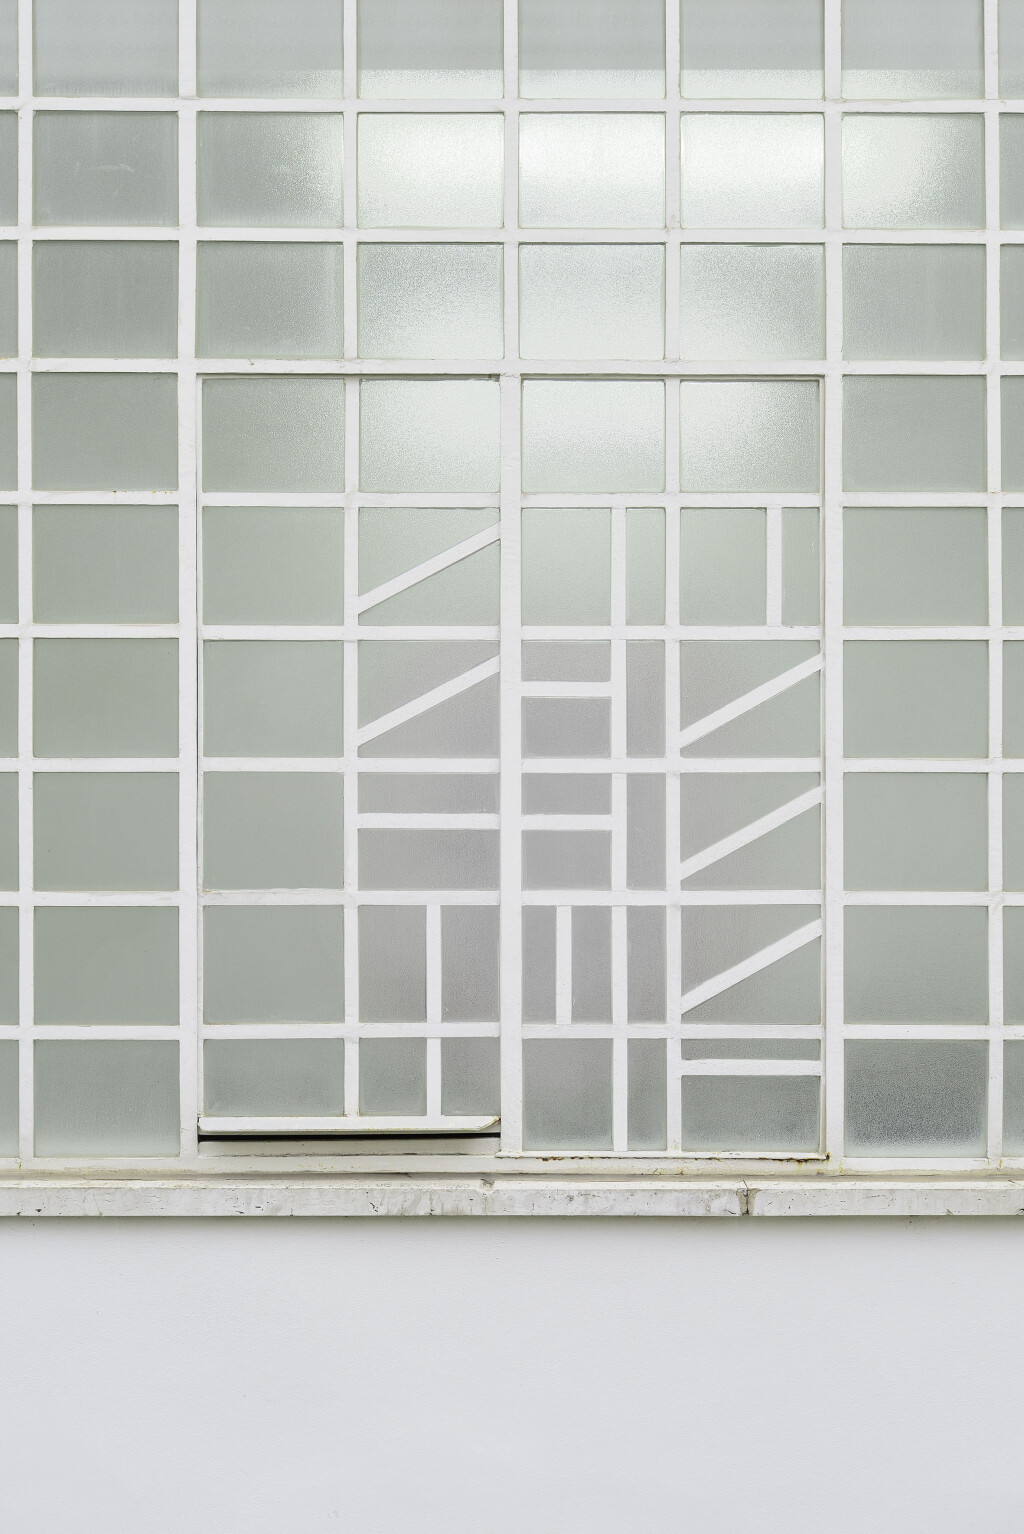 Galleria Mario Iannelli_Monochromes_Mullan_7